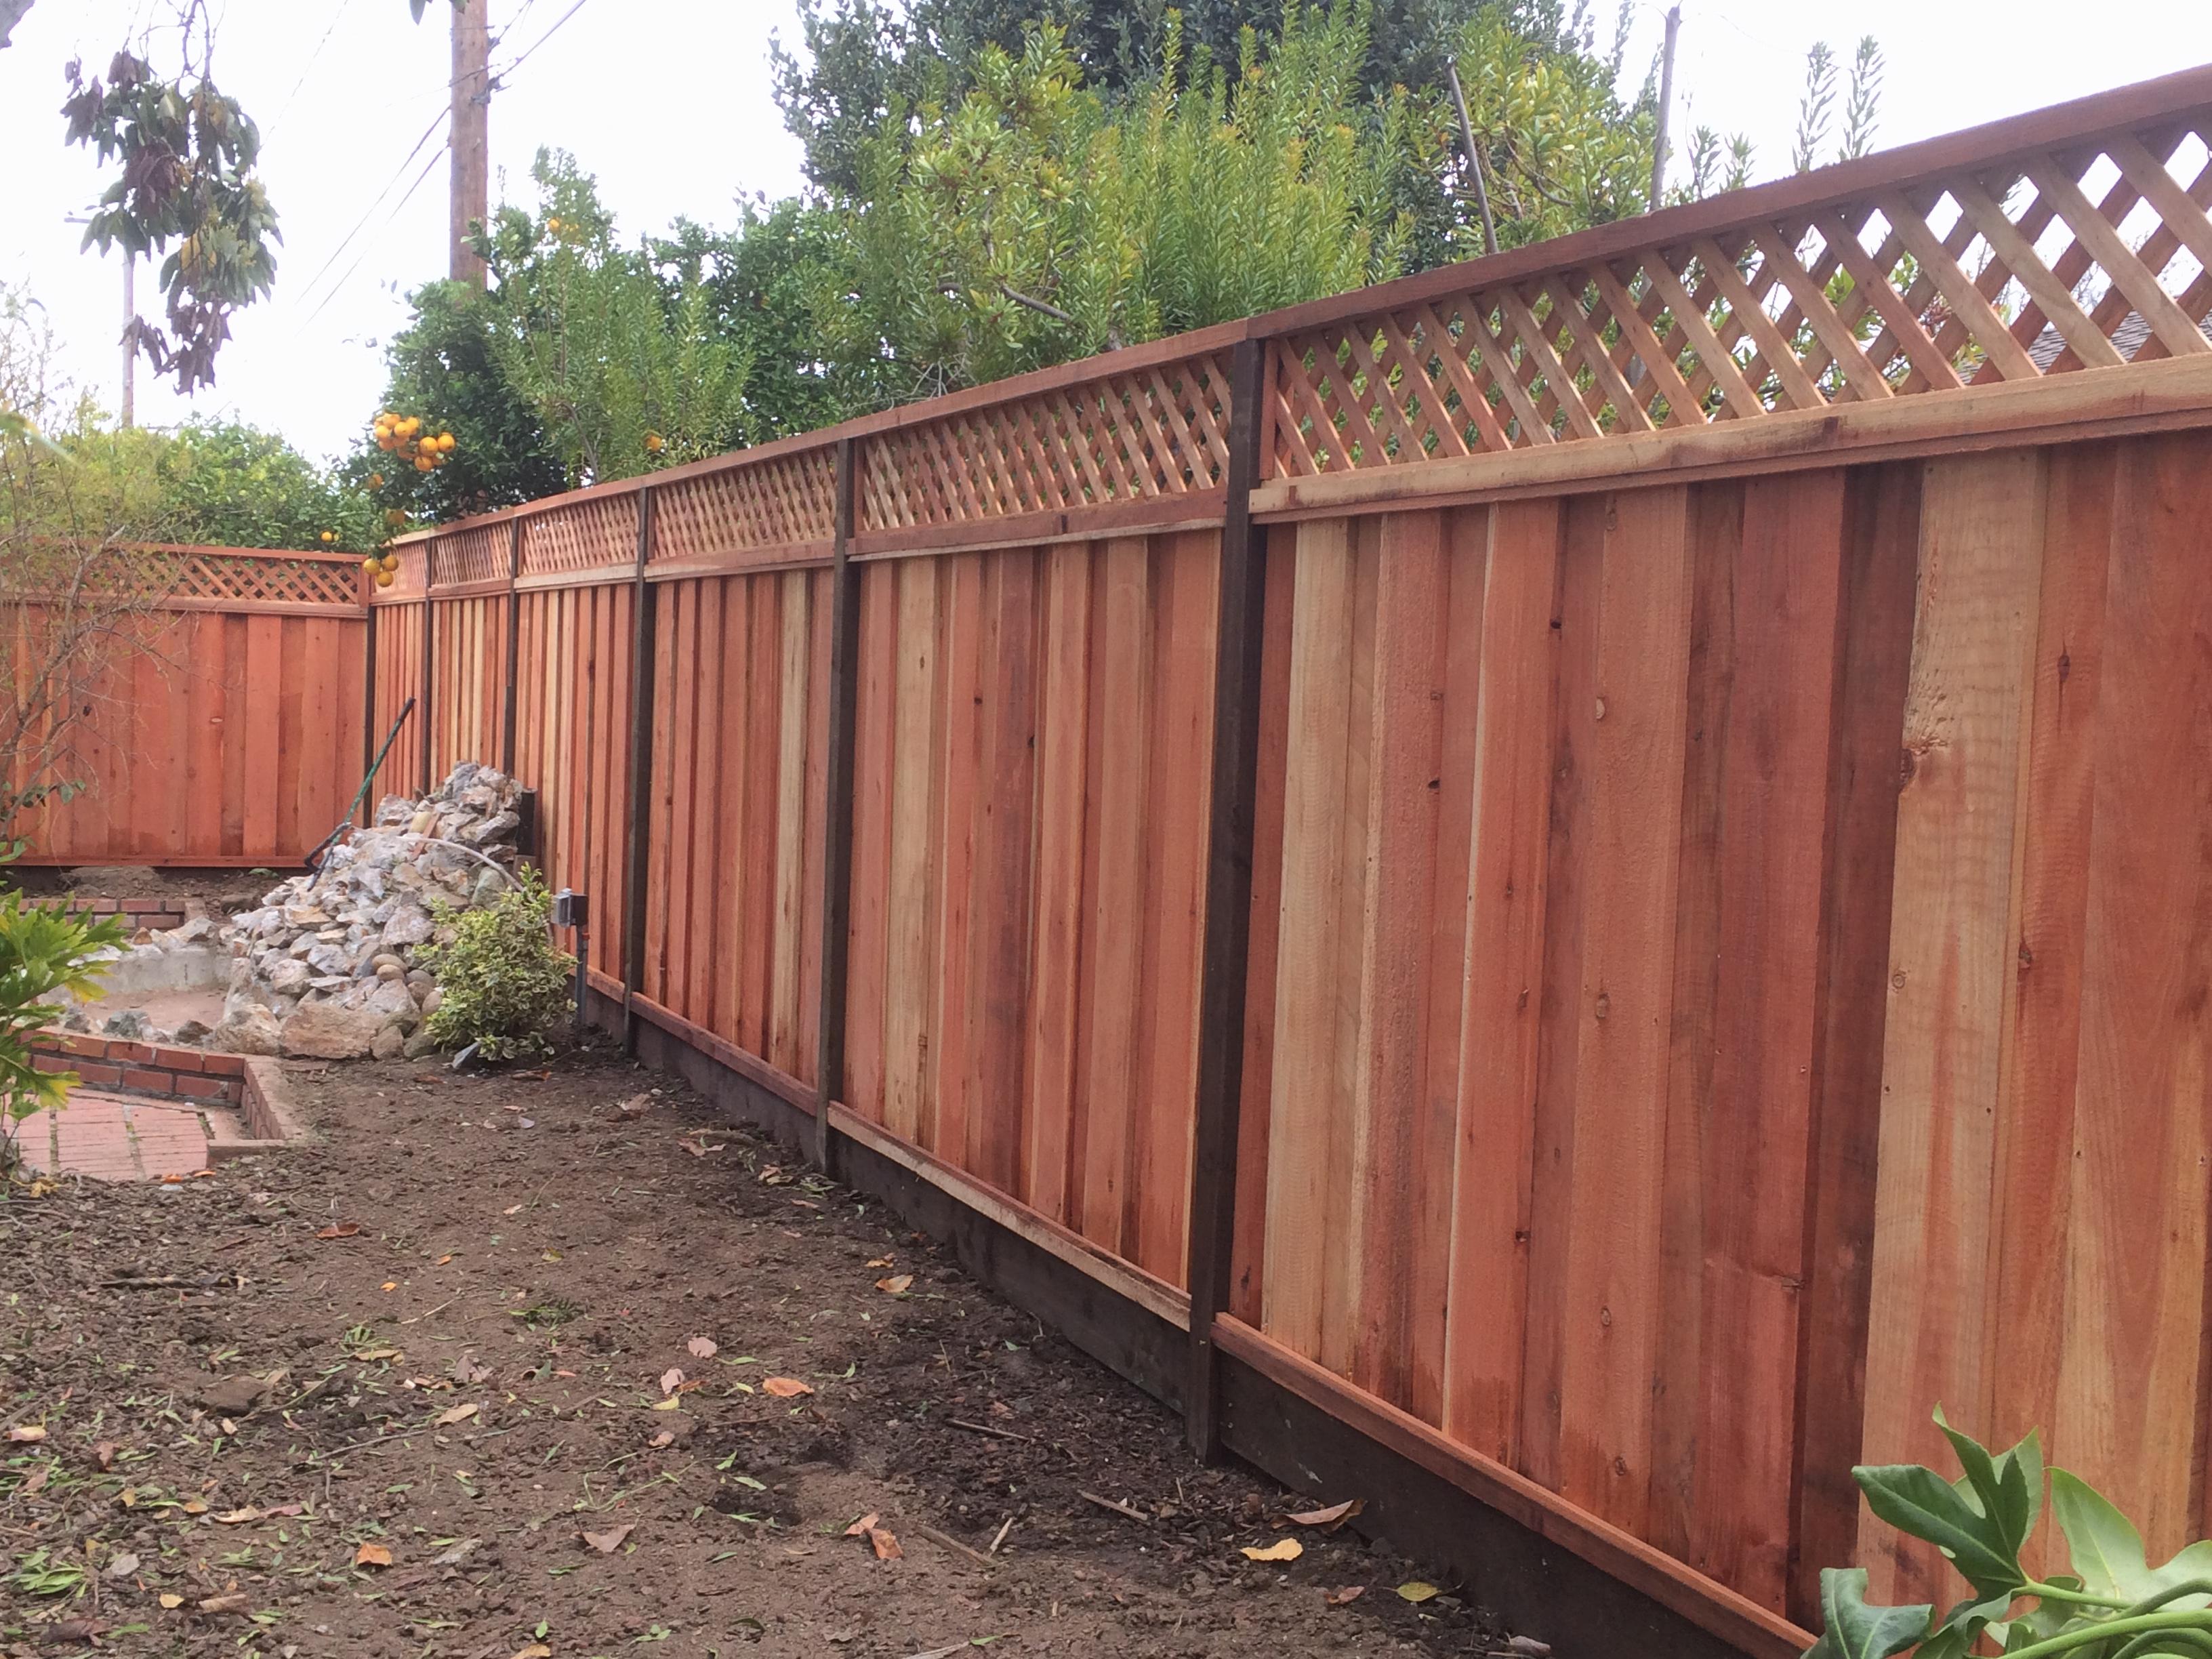 Board on Board fence with lattice